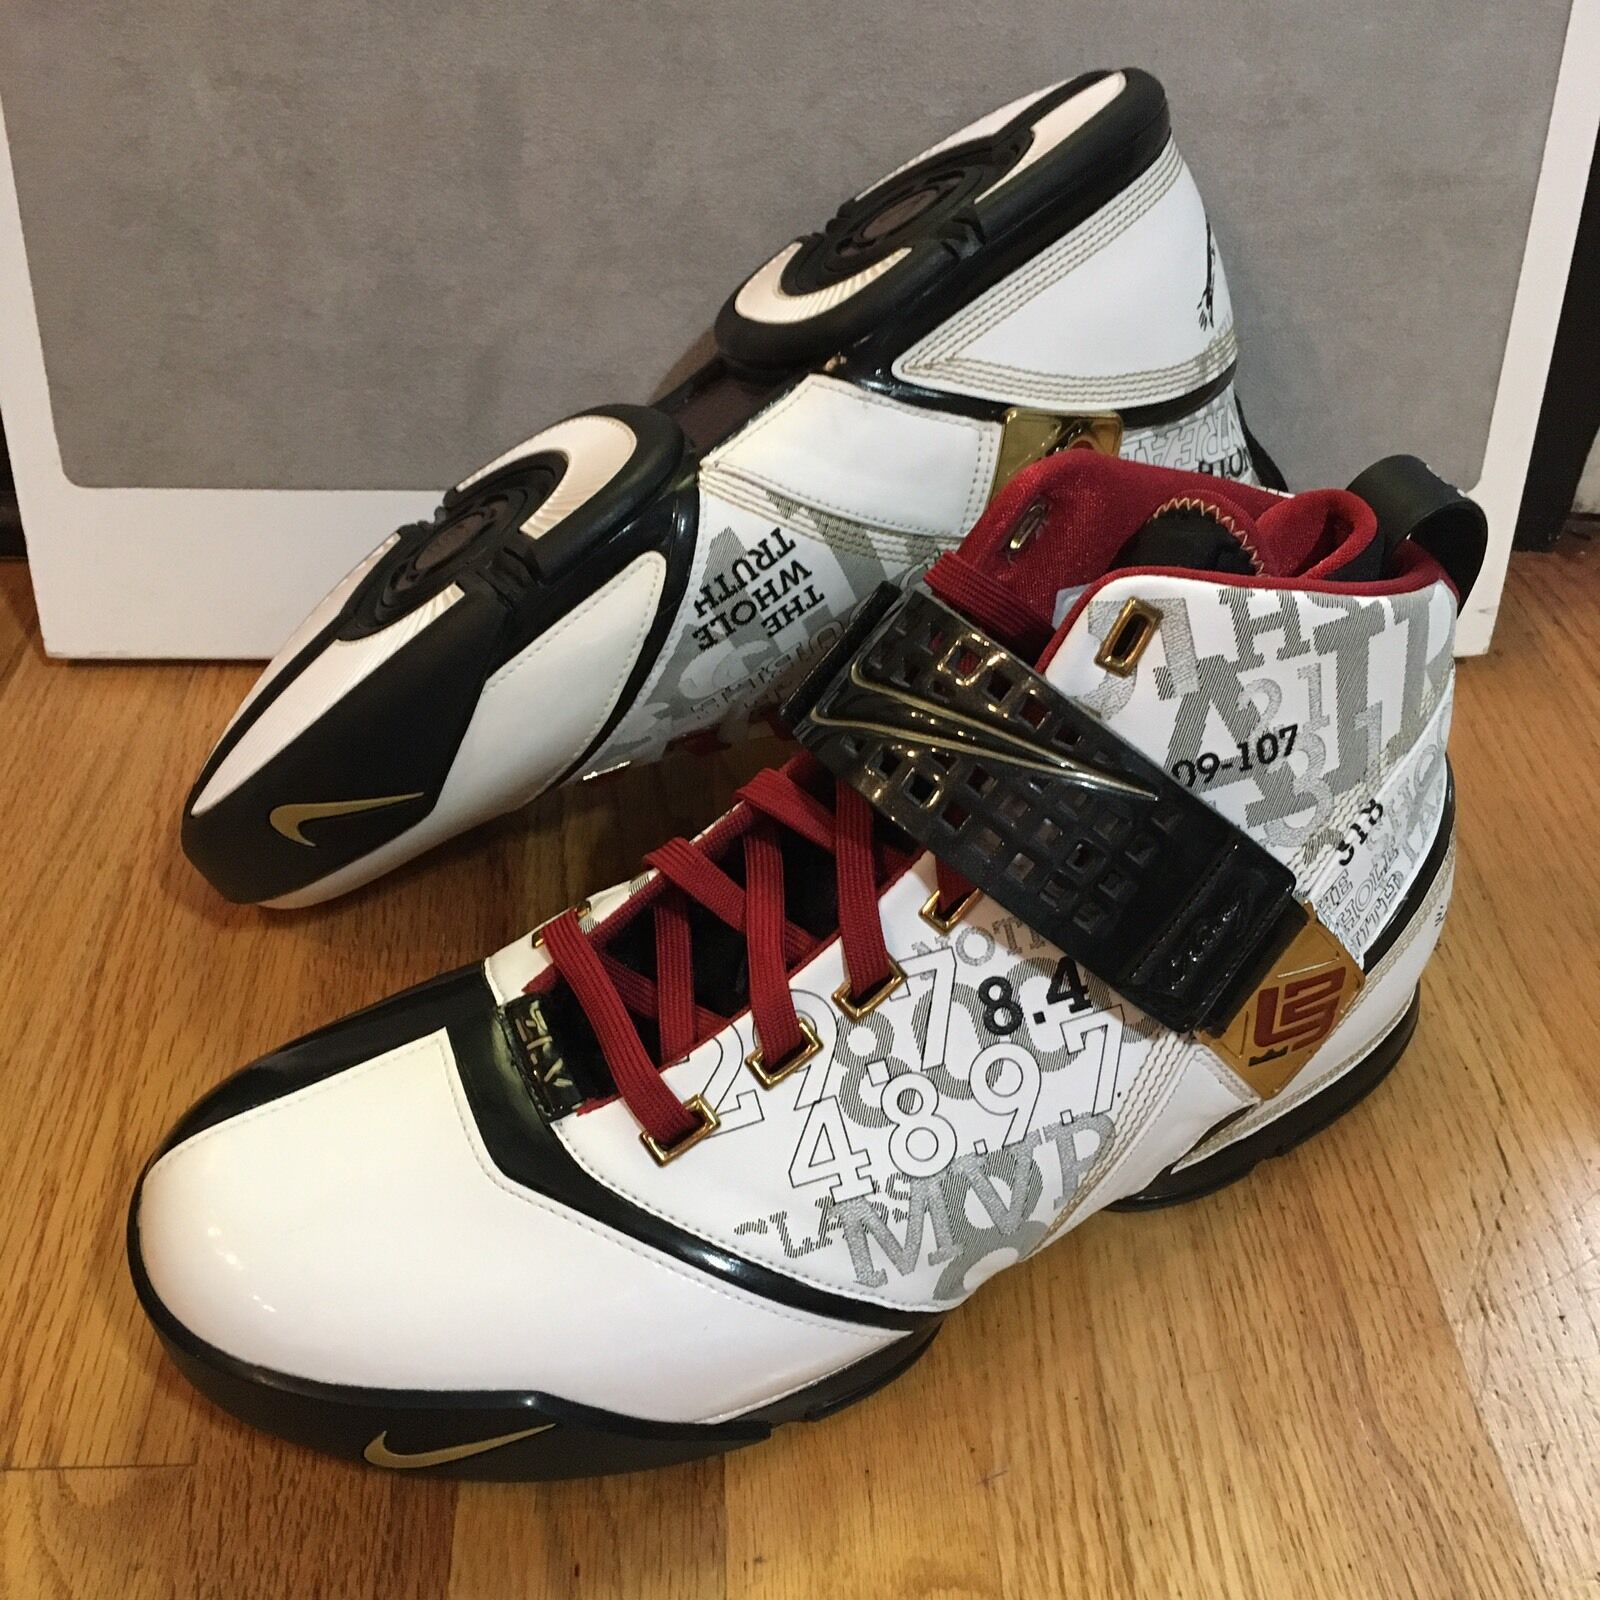 Nike Zoom Lebron V Milk Crate White Black Metallic gold Men's Size 14 Basketball